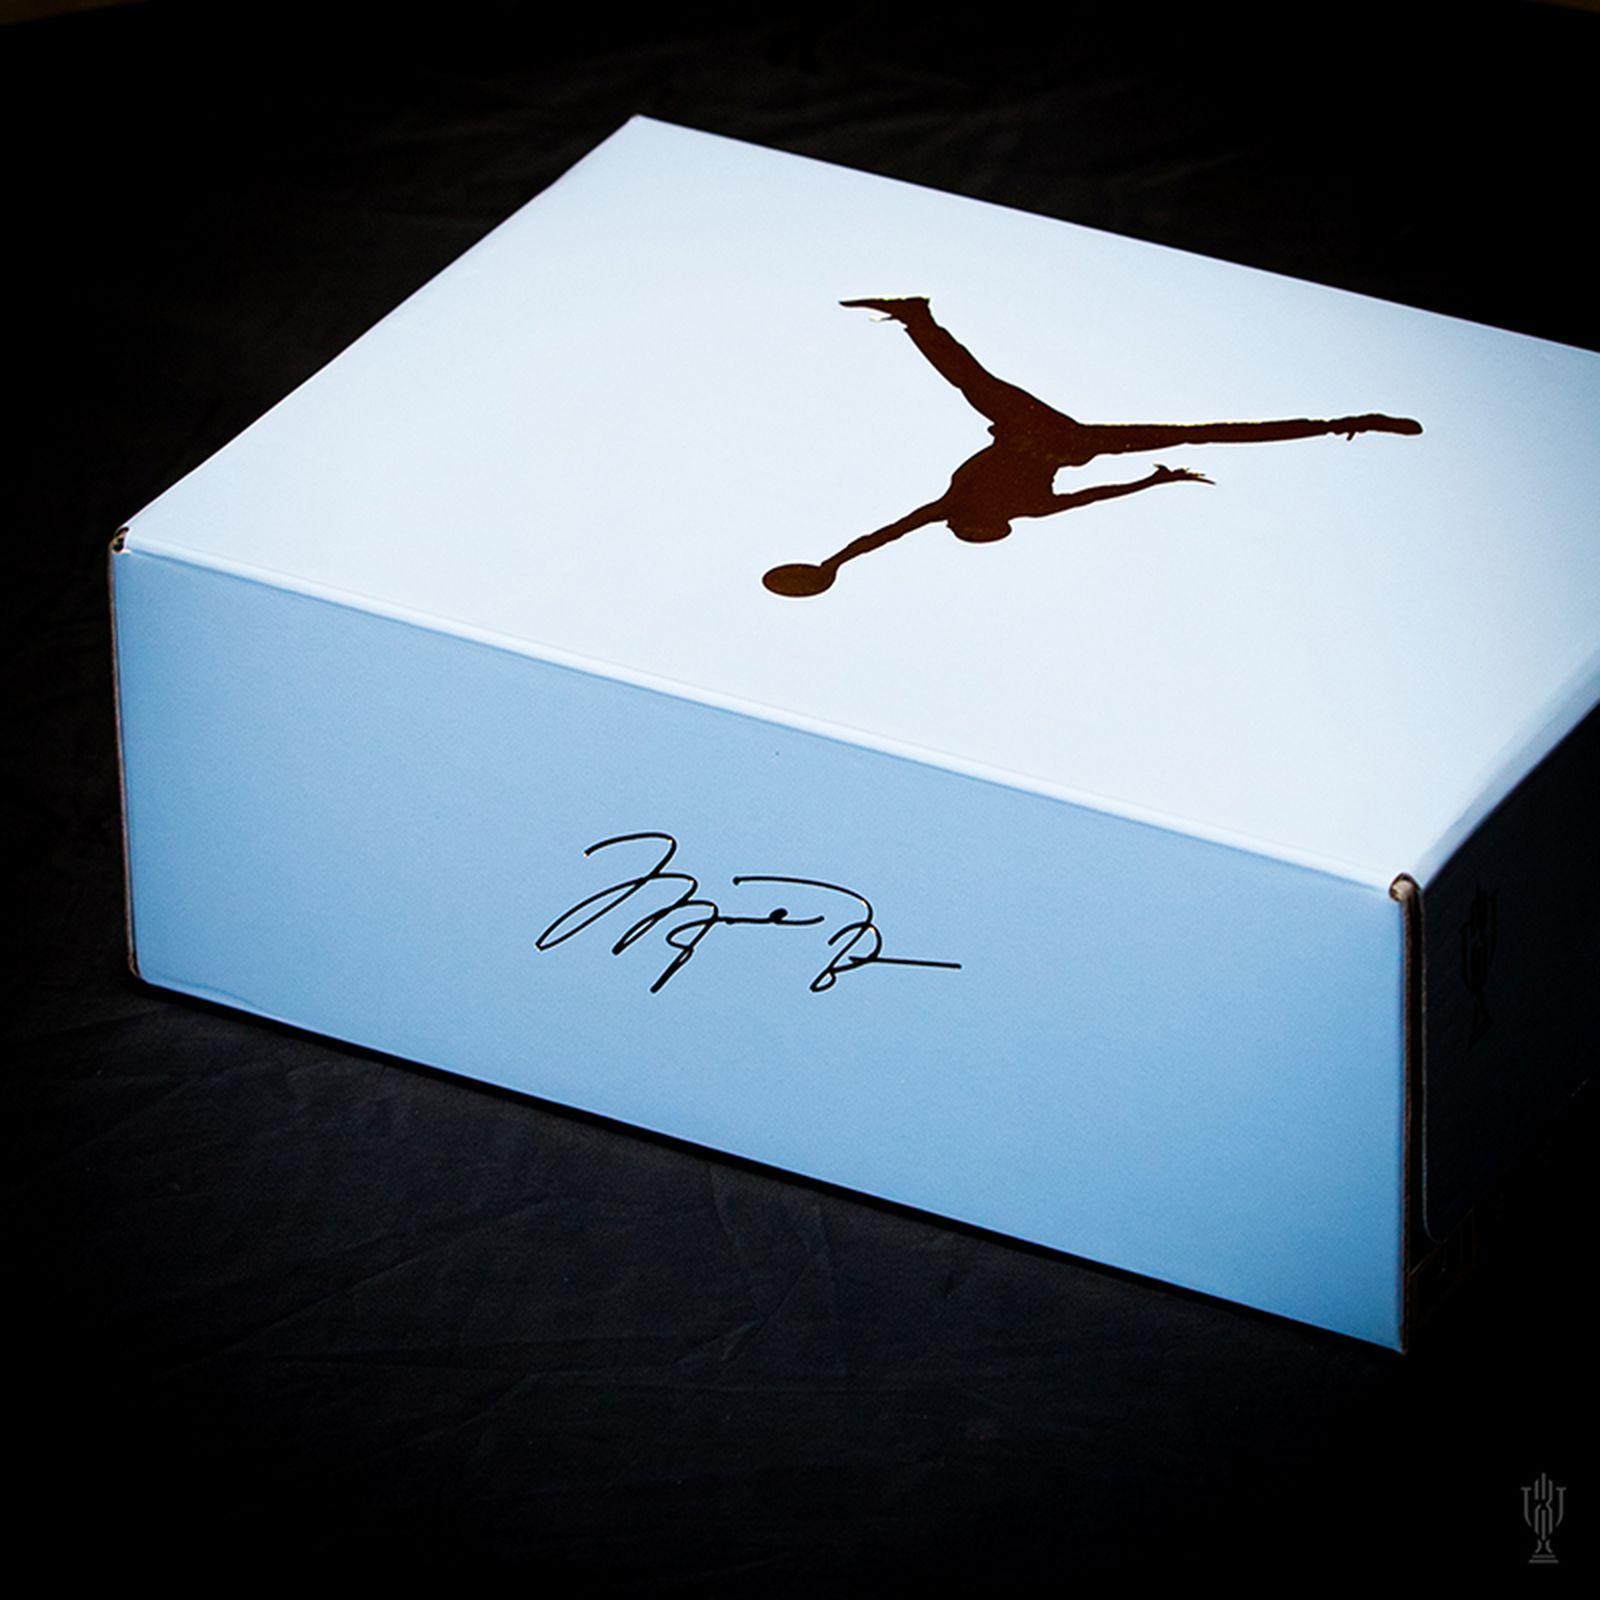 trophy room air jordan 5 release date price jordan brand